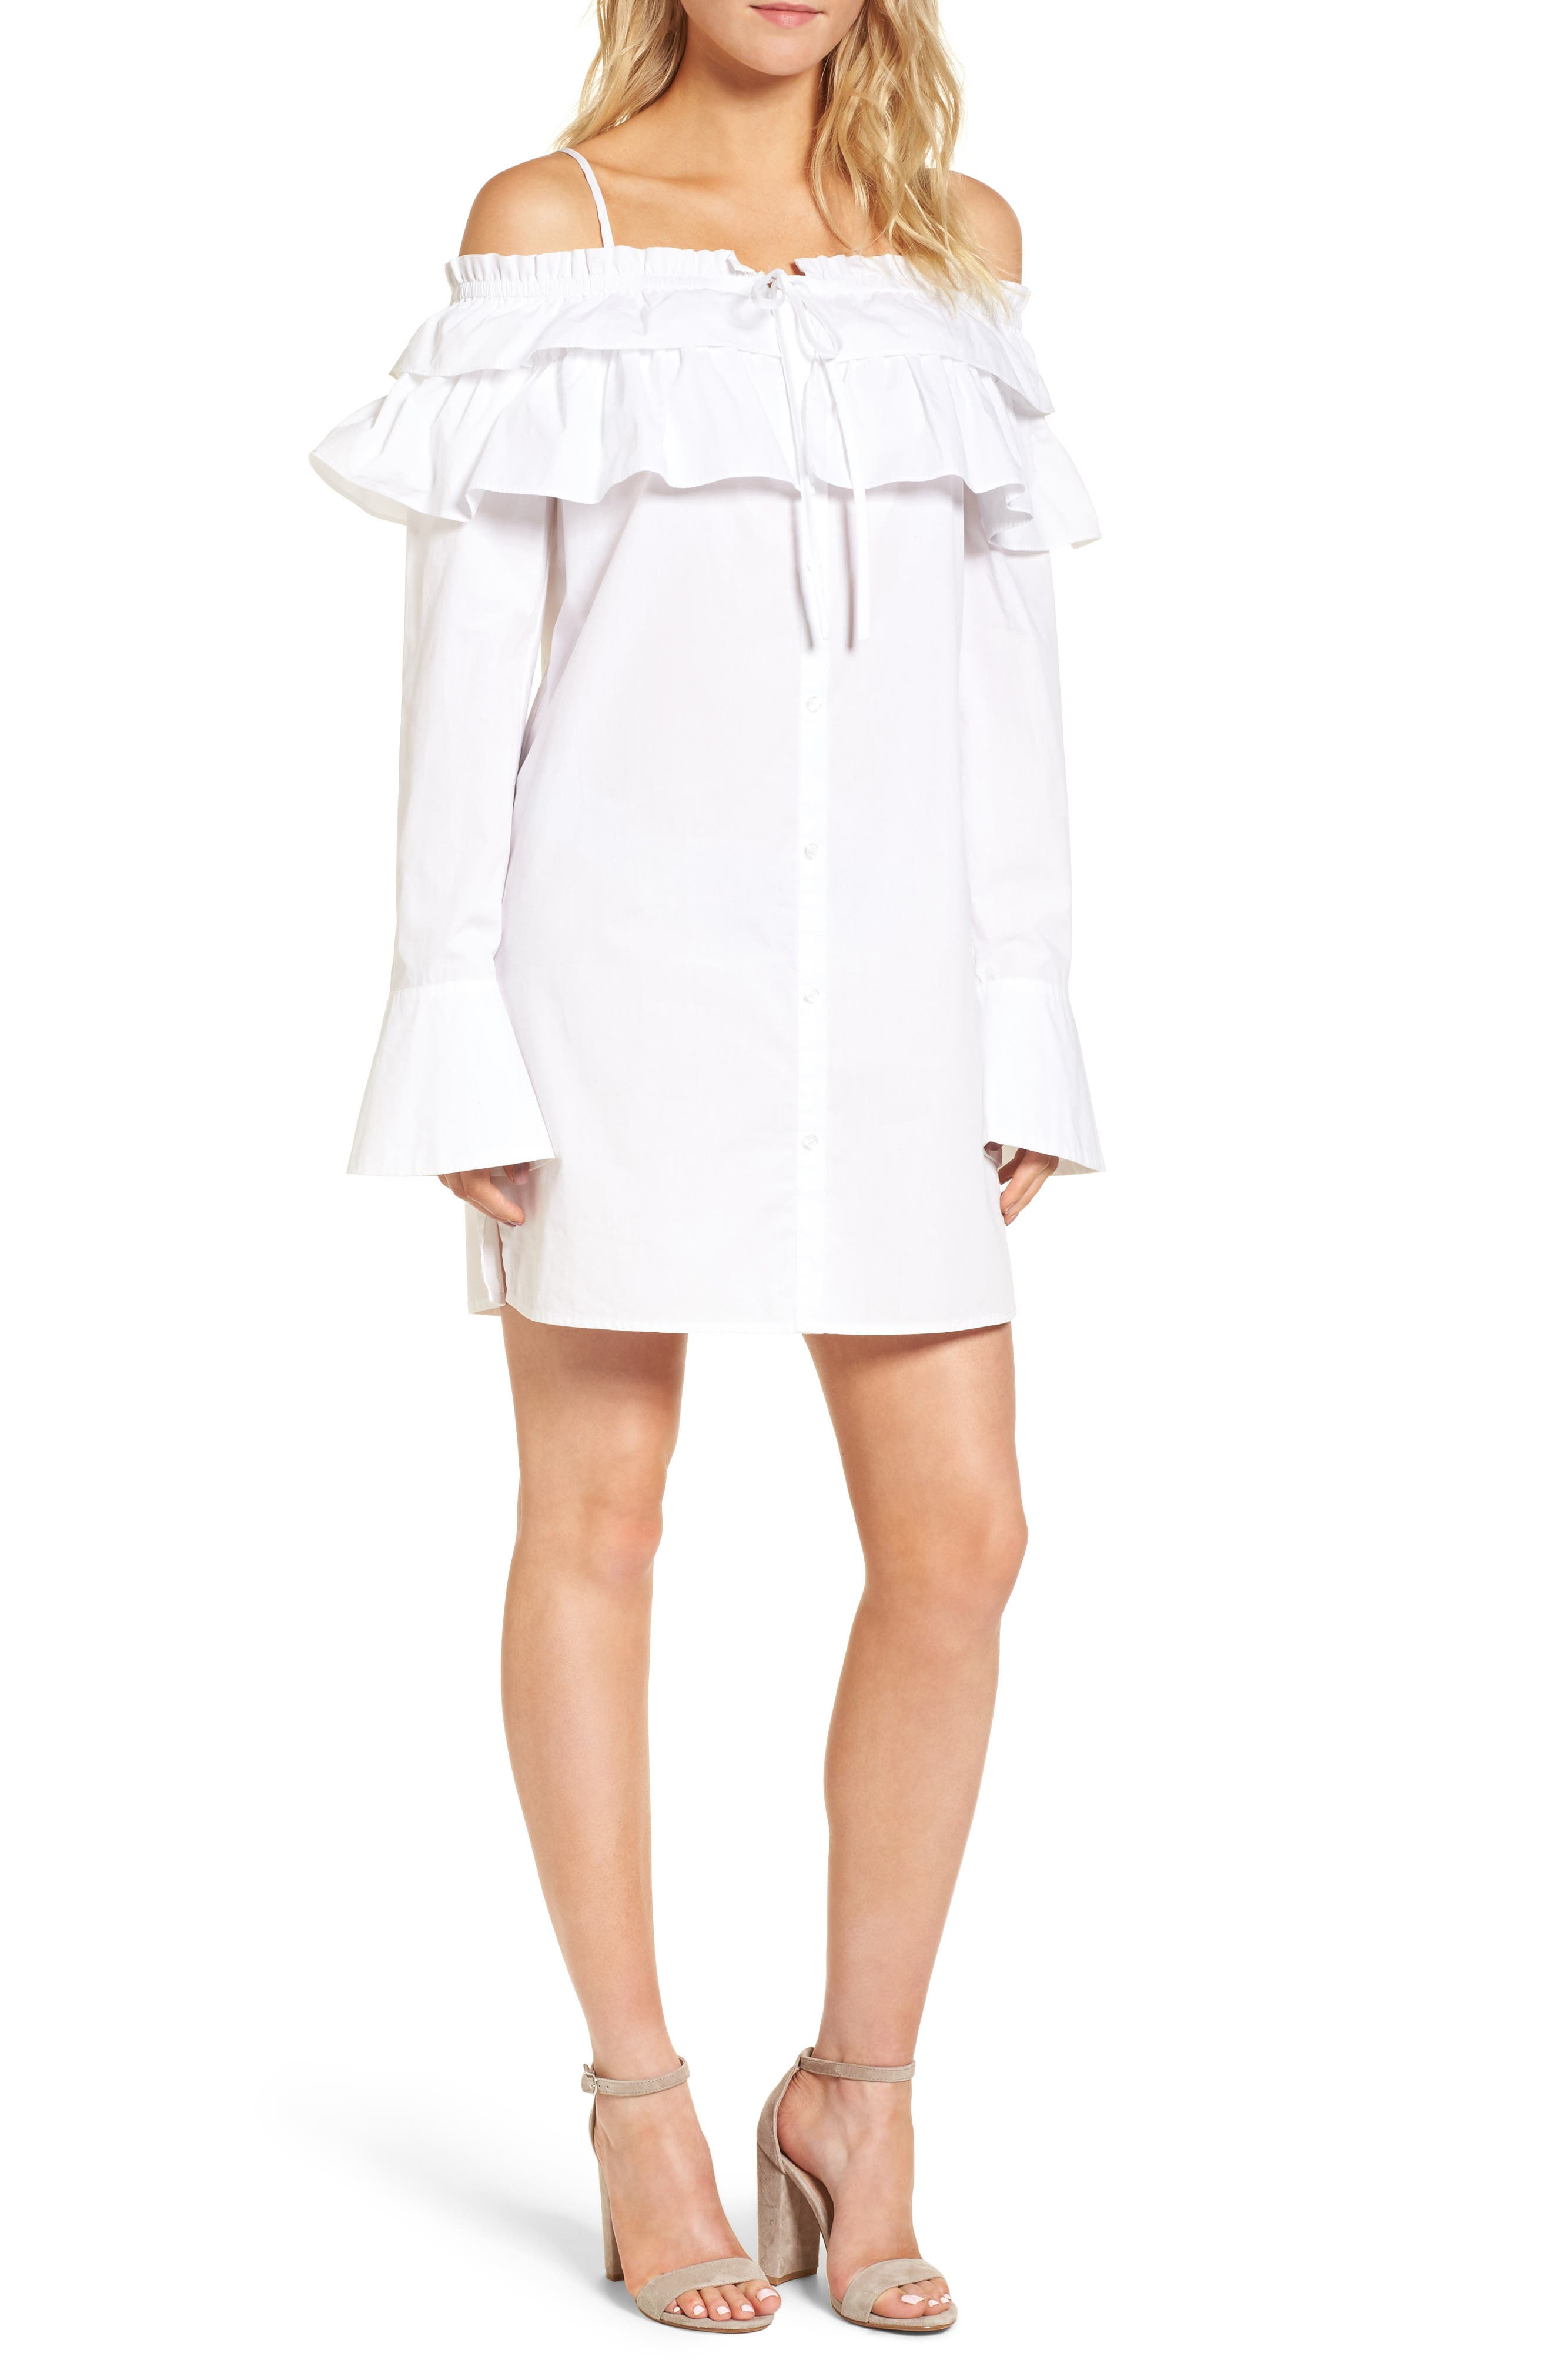 Alternate Image 1 Selected - Rebecca Minkoff Pallas Off the Shoulder Dress